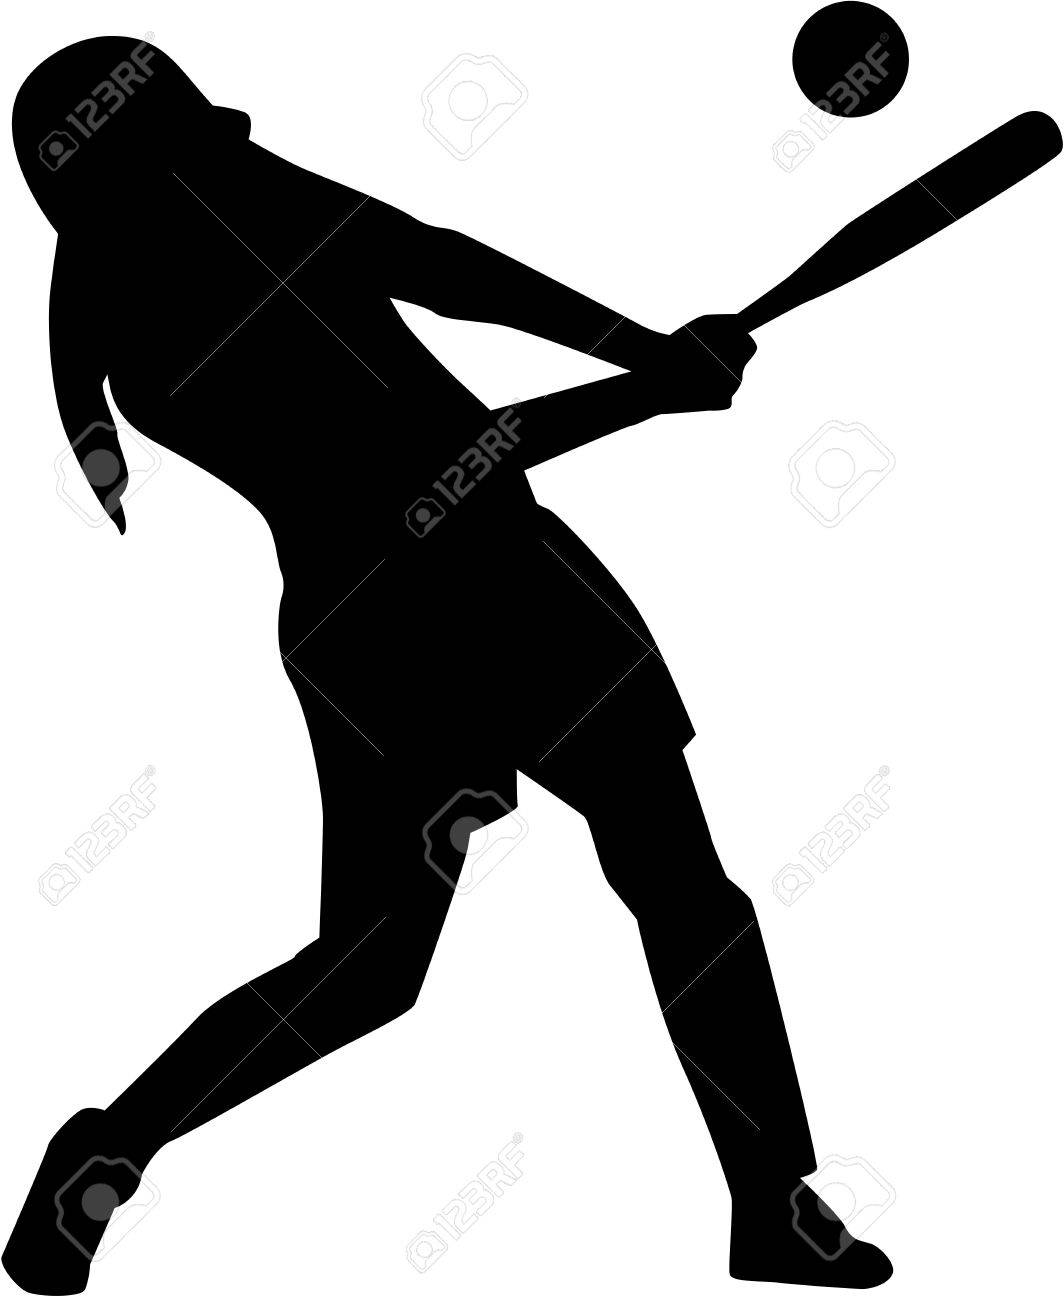 Softball batter woman silhouette.